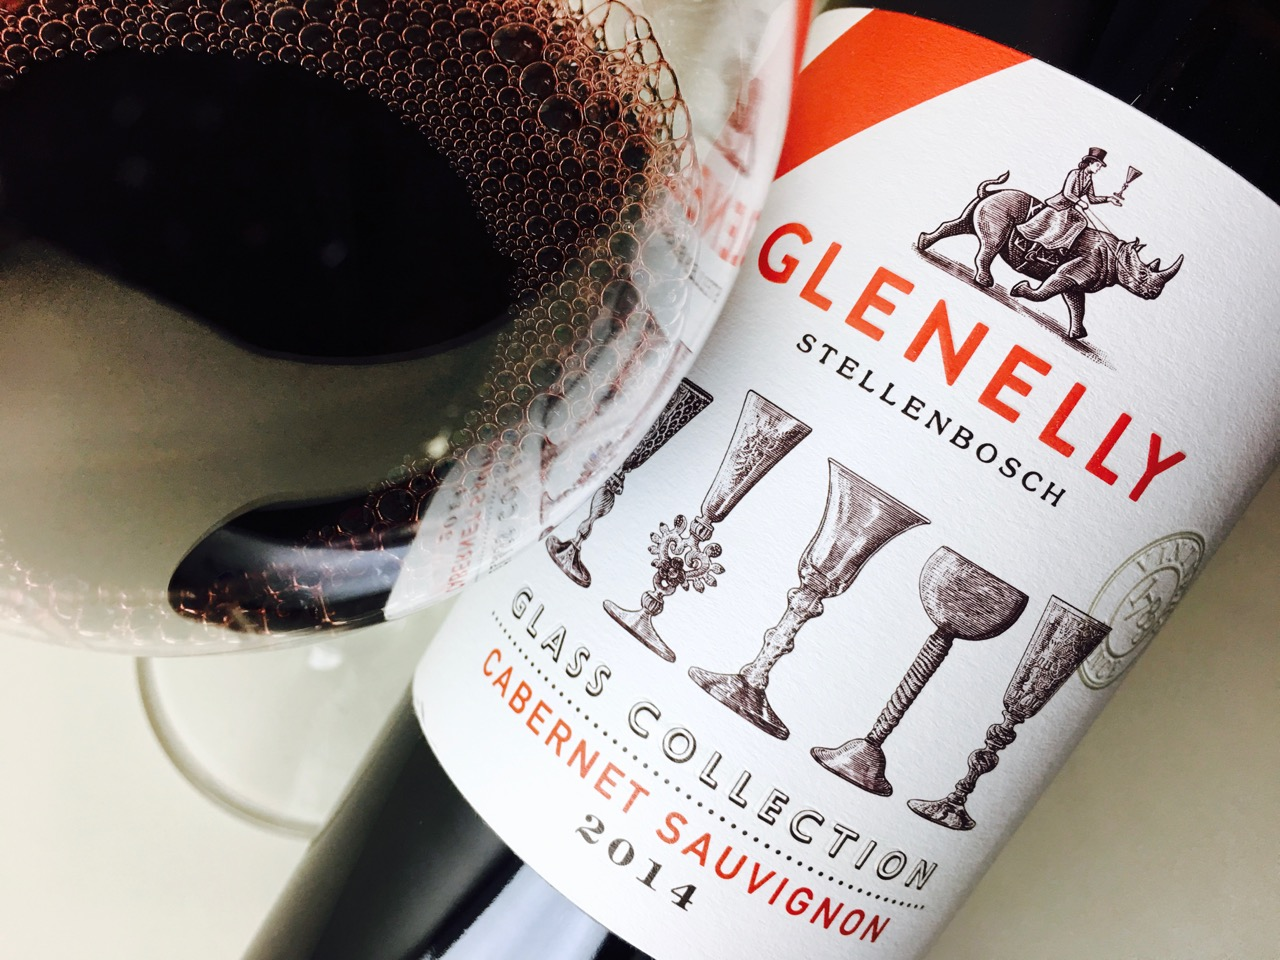 2014 Glenelly Cabernet Sauvignon Glass Collection Stellenbosch